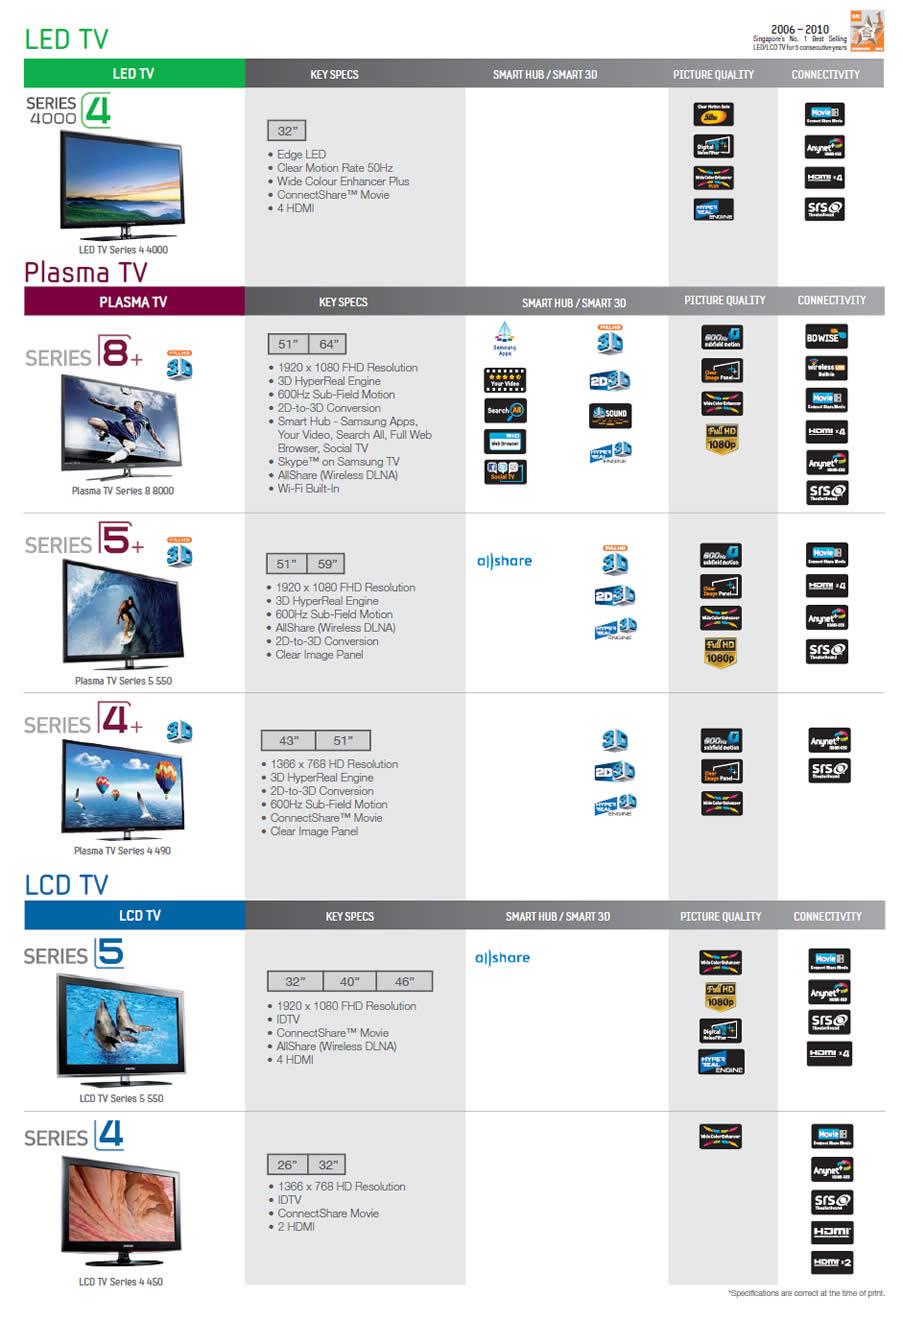 COMEX 2011 price list image brochure of Samsung TV LED Series 4000 Plasma 8 5 LCD 5 4